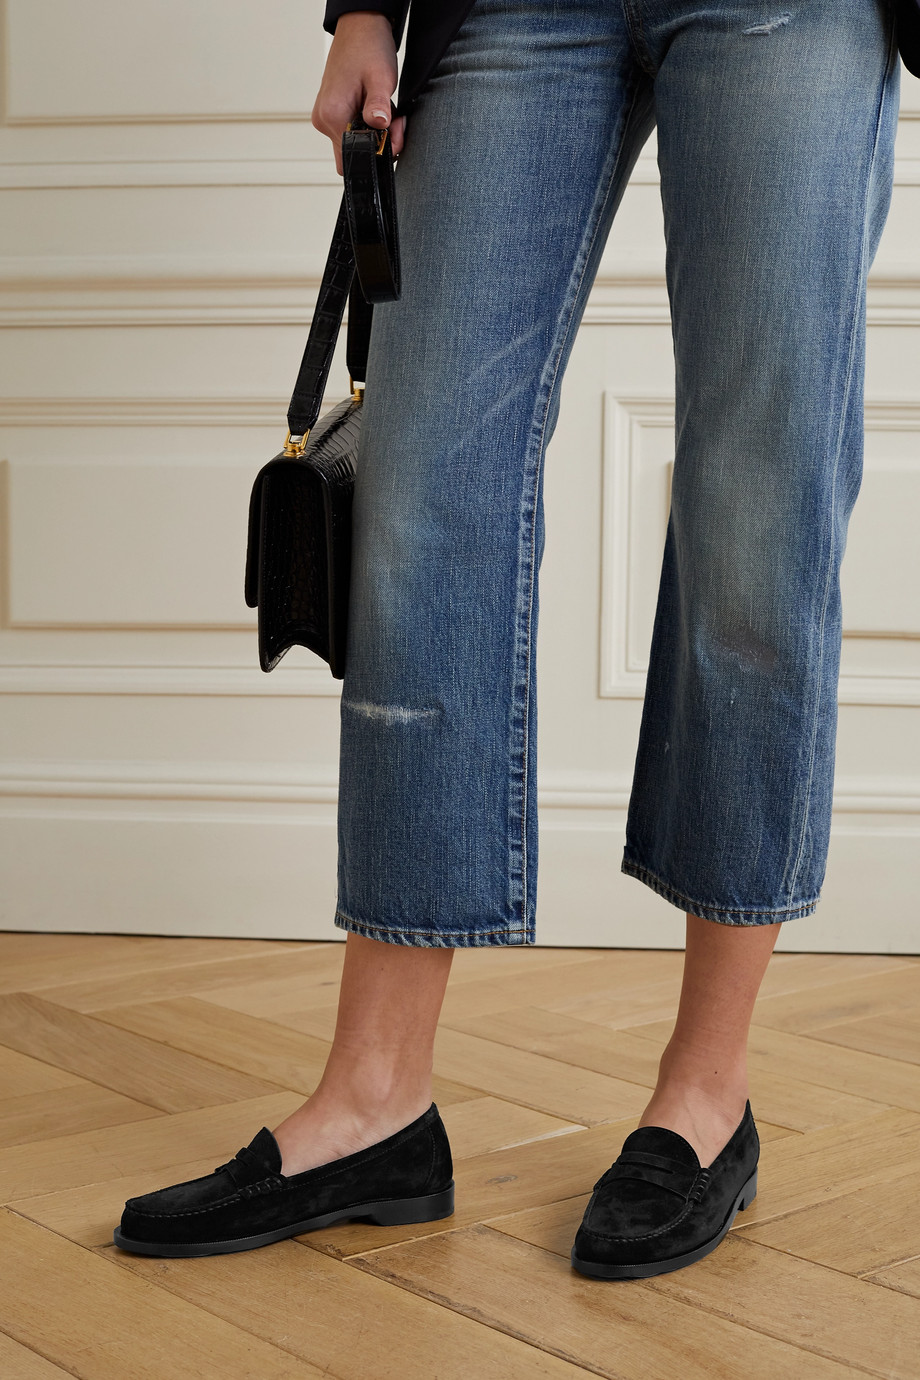 SAINT LAURENT Suede loafers